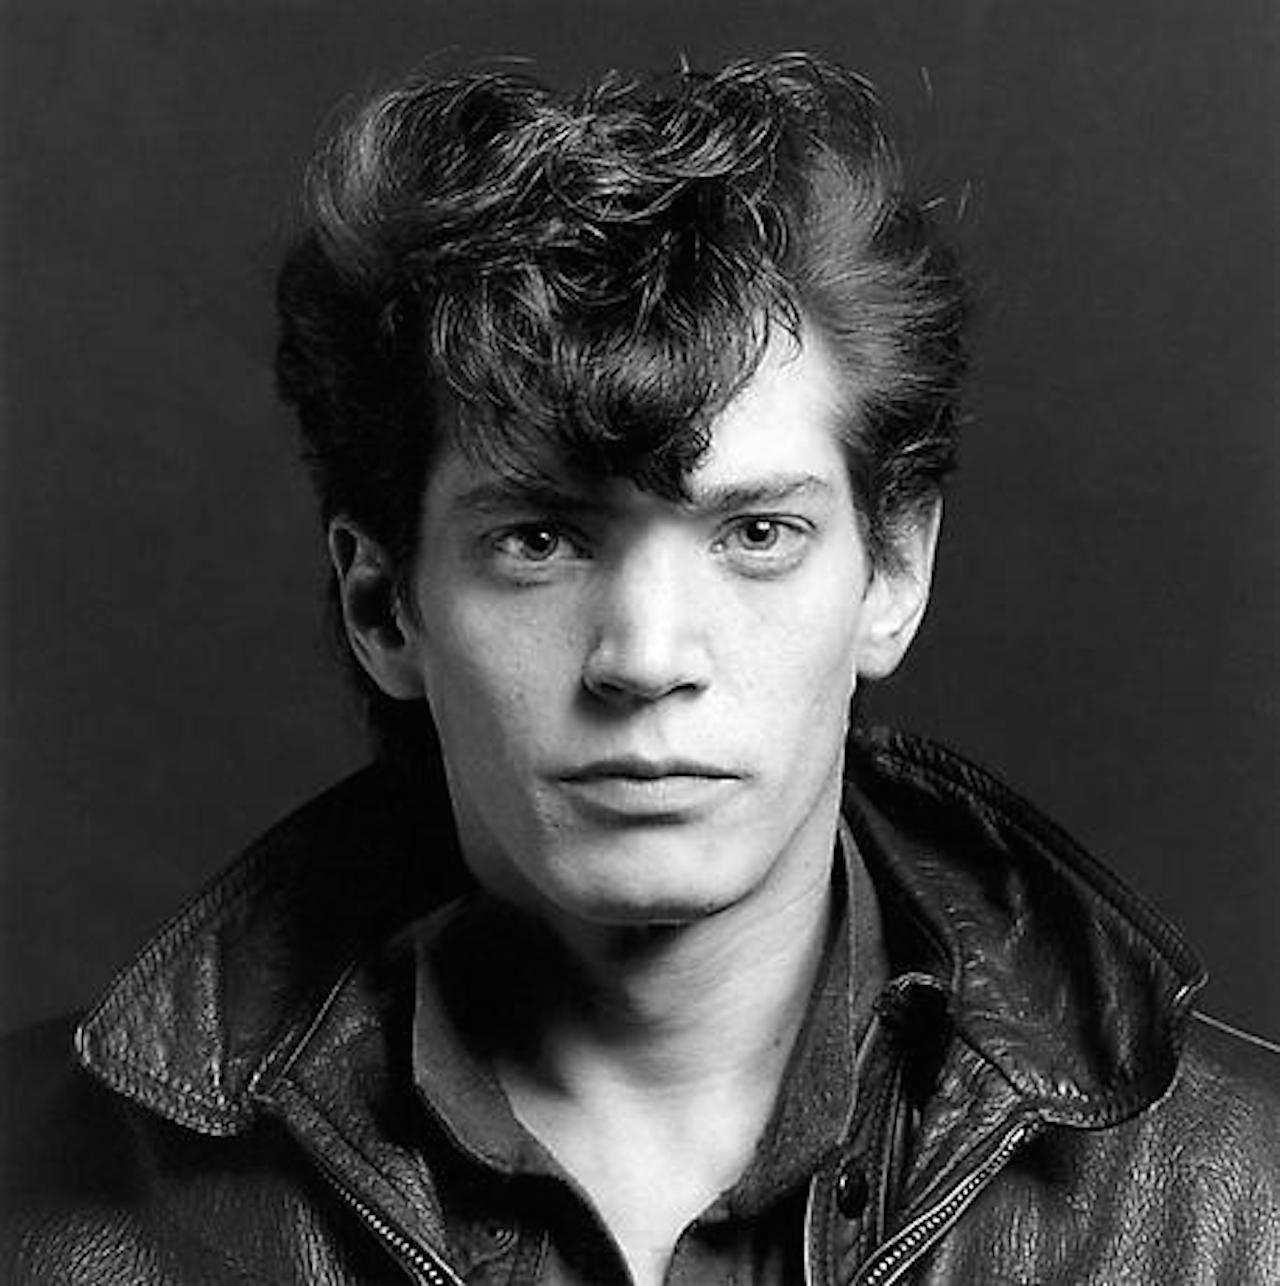 Robert_Mapplethorpe,_Self-portrait,_1980